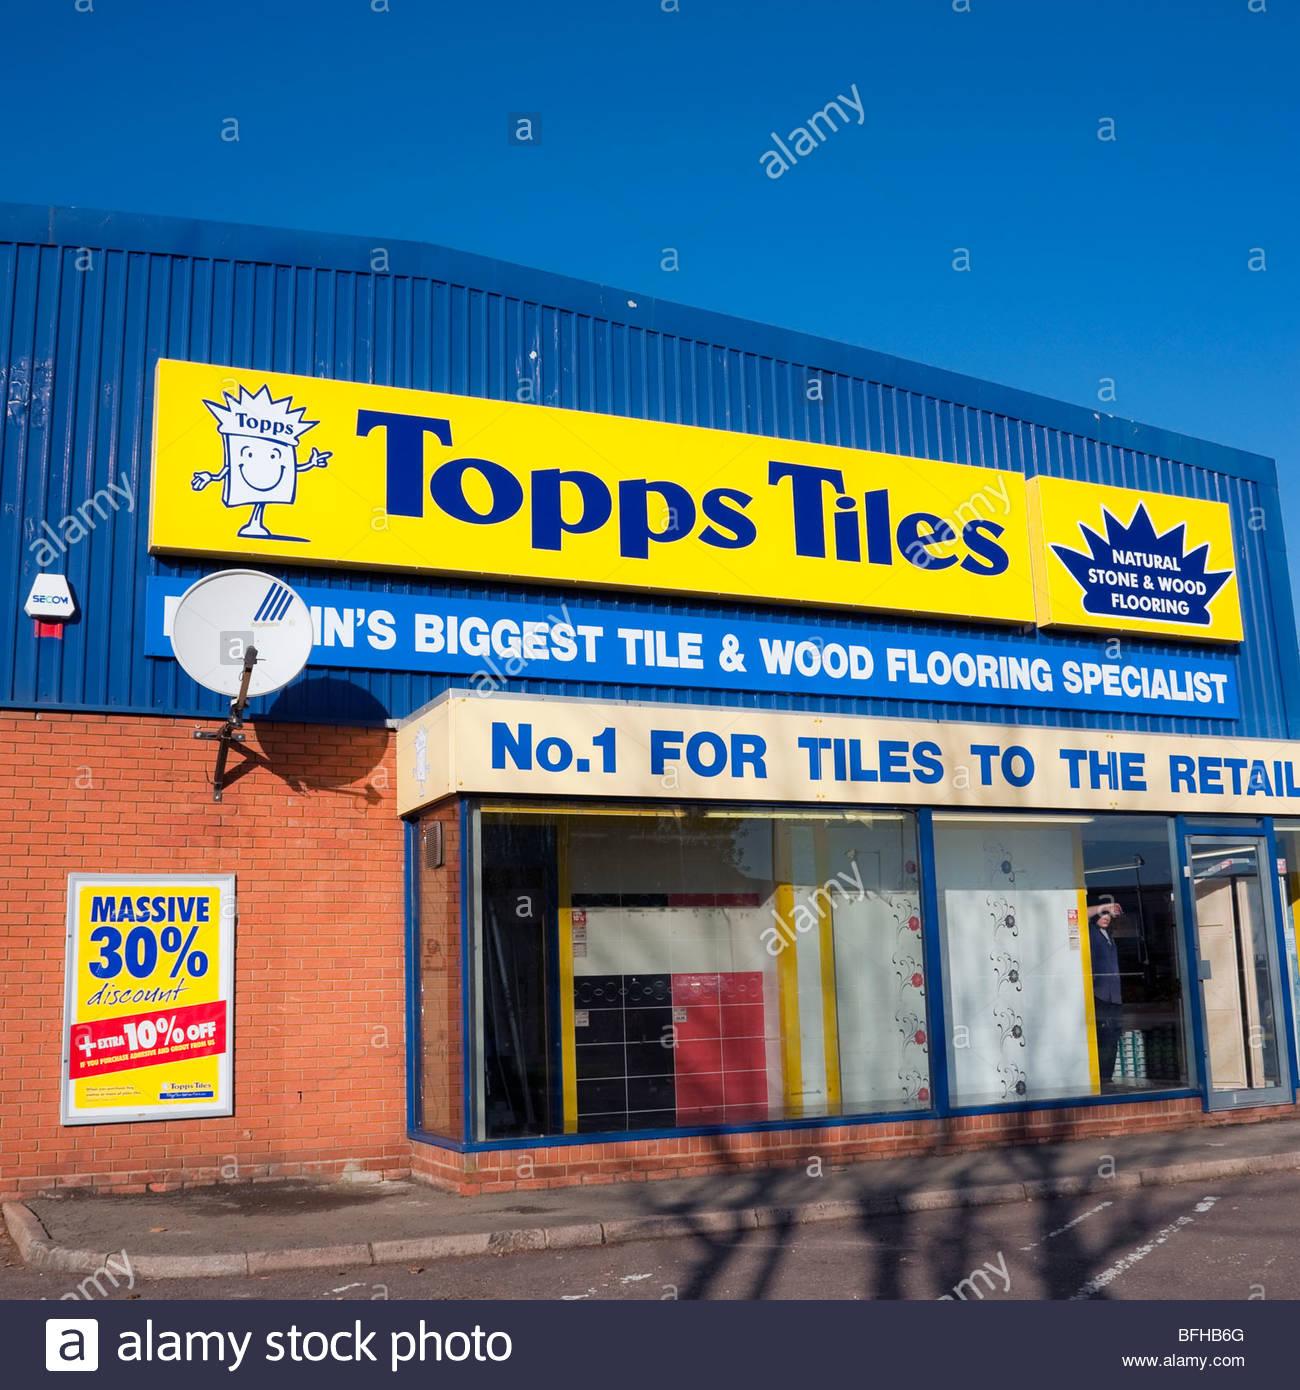 Topps tiles shop britains biggest tile wood flooring stock photo topps tiles shop britains biggest tile wood flooring specialist topps tiles retail unit uk dailygadgetfo Images